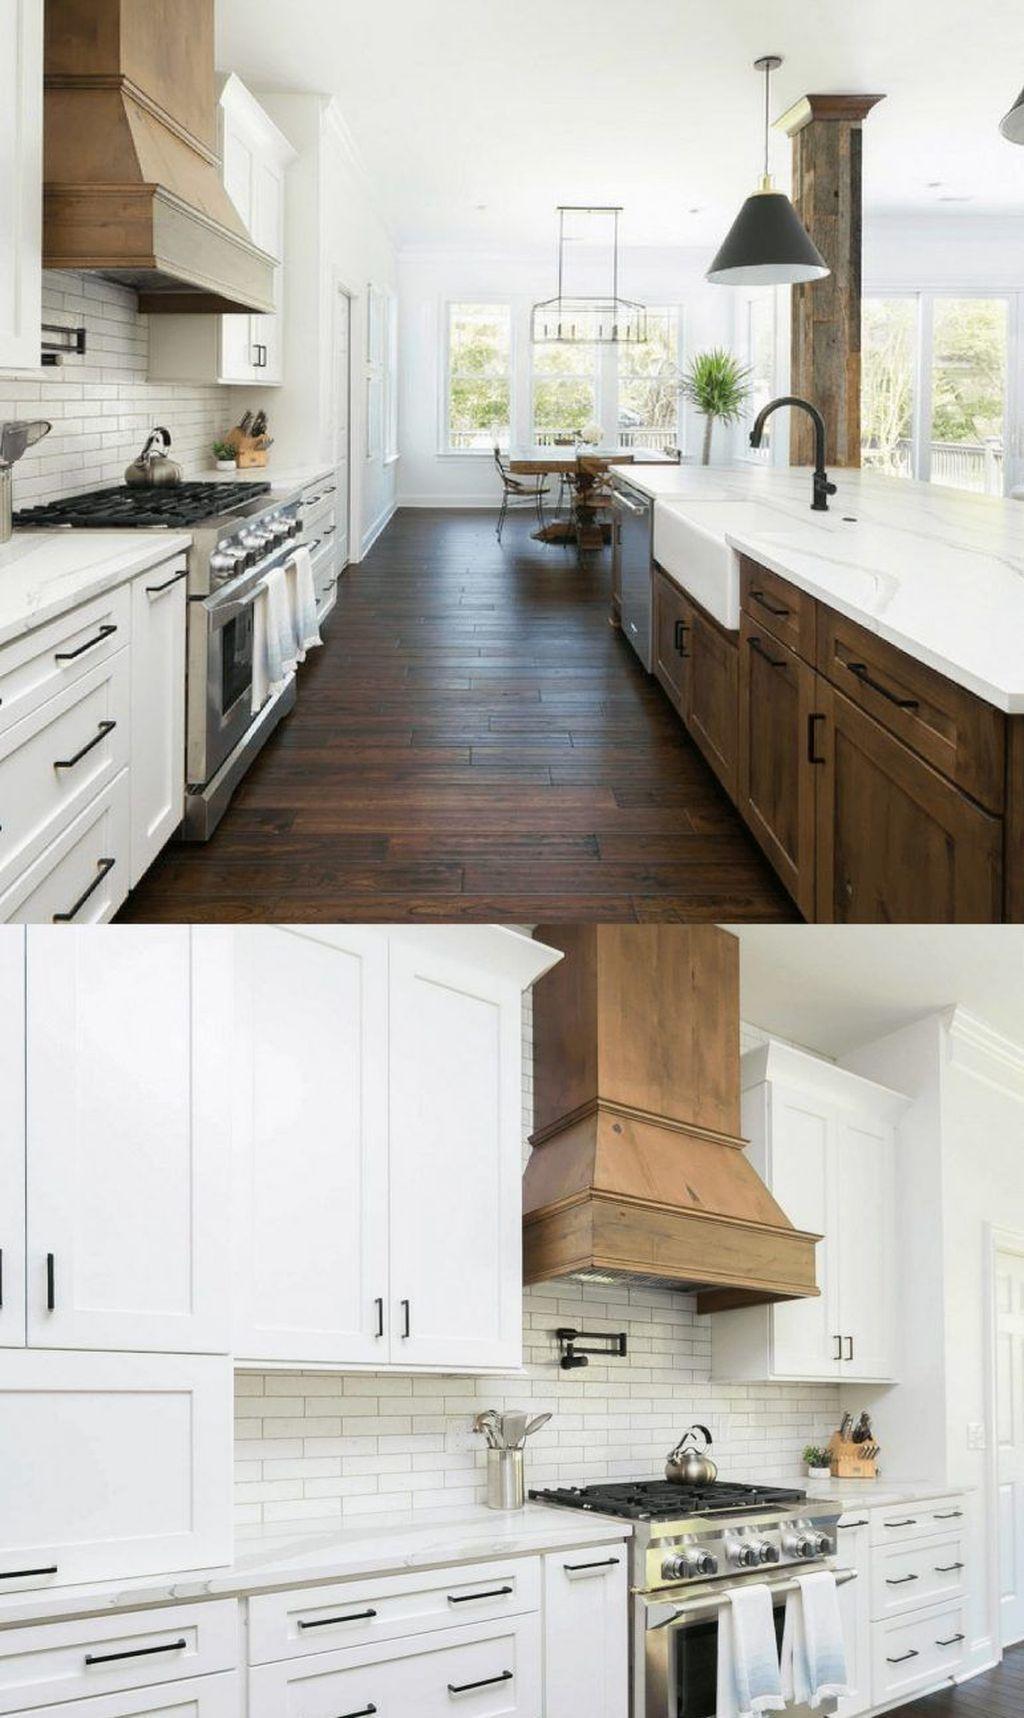 Brilliant Small Kitchen Remodel Design Ideas On A Budget 15